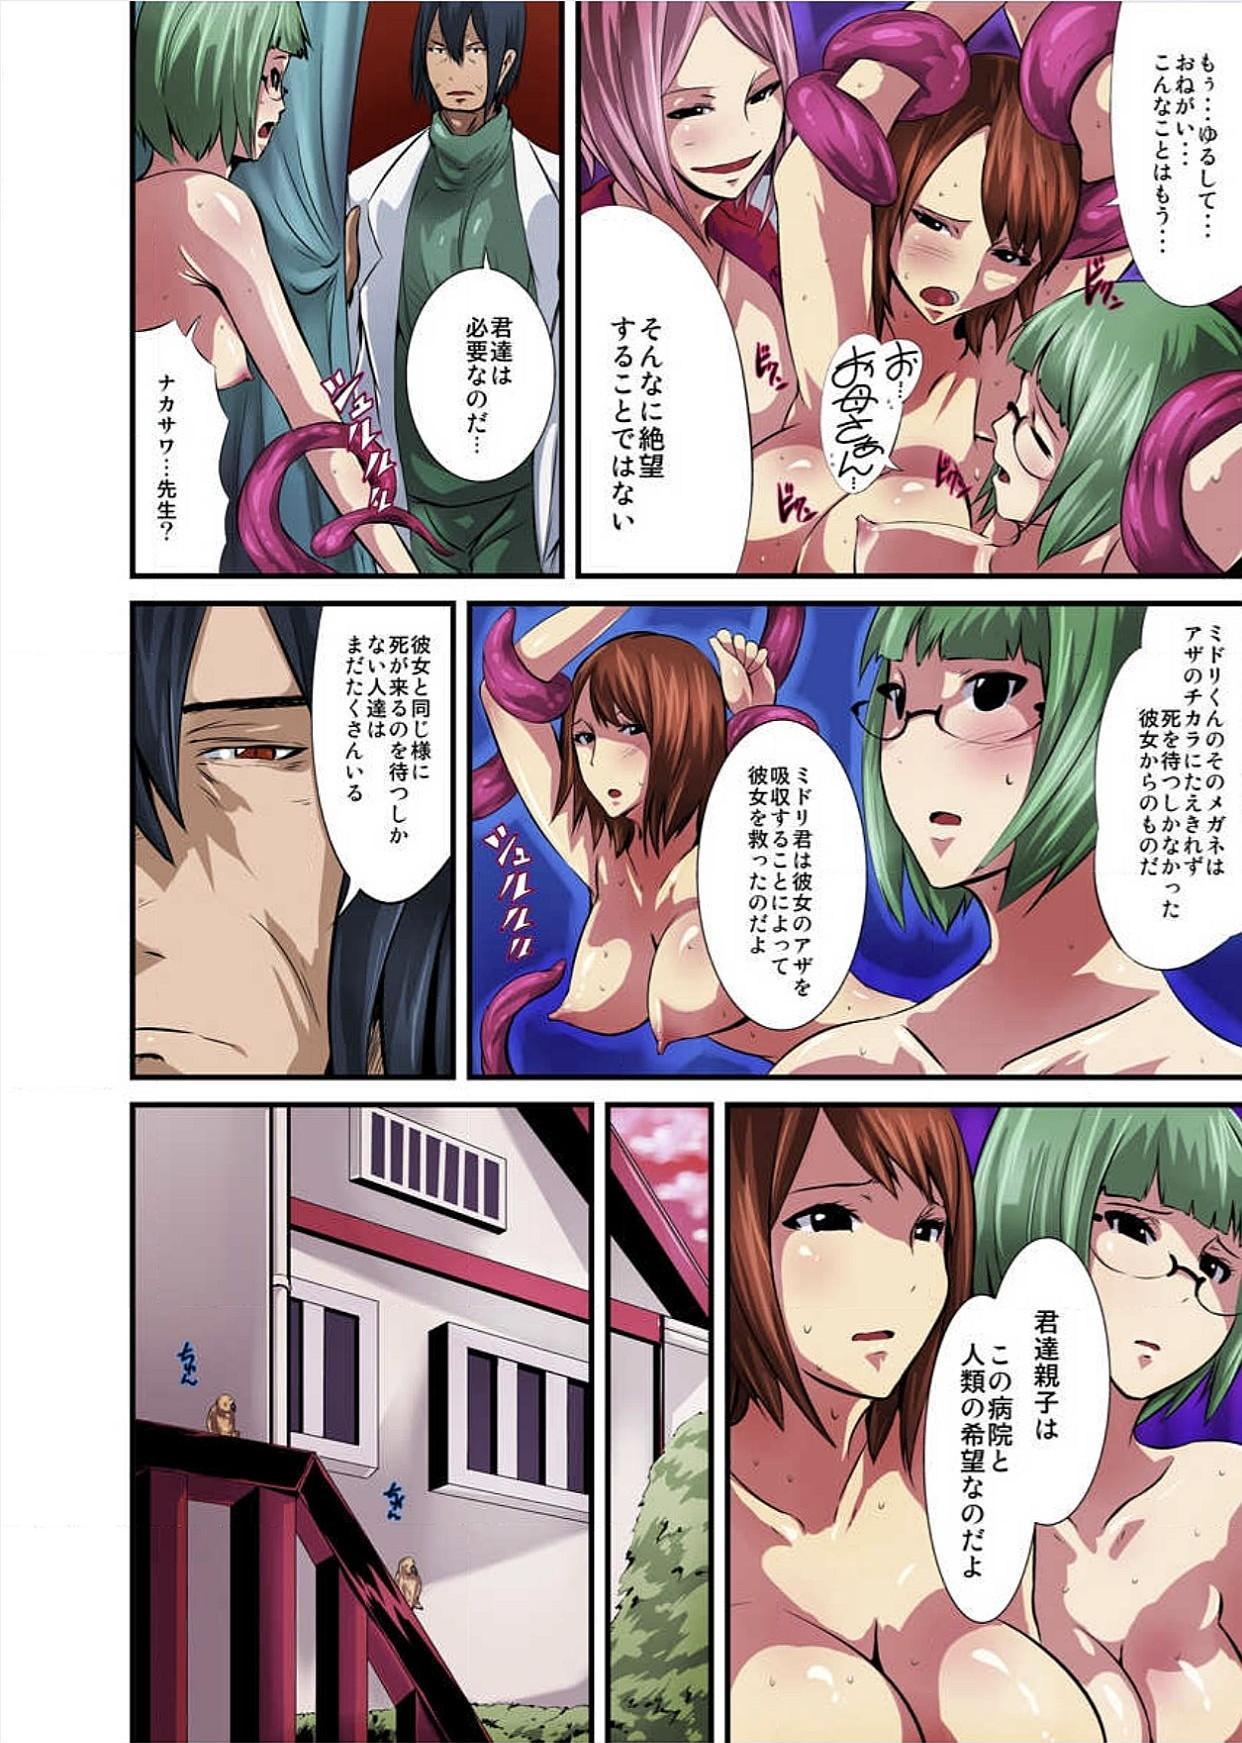 [Tomihero,] Shokushu Byoutou ~Itsuwari no Sanbujinka~ (Full Color) 【Tokusou Han】 [Digital] 145